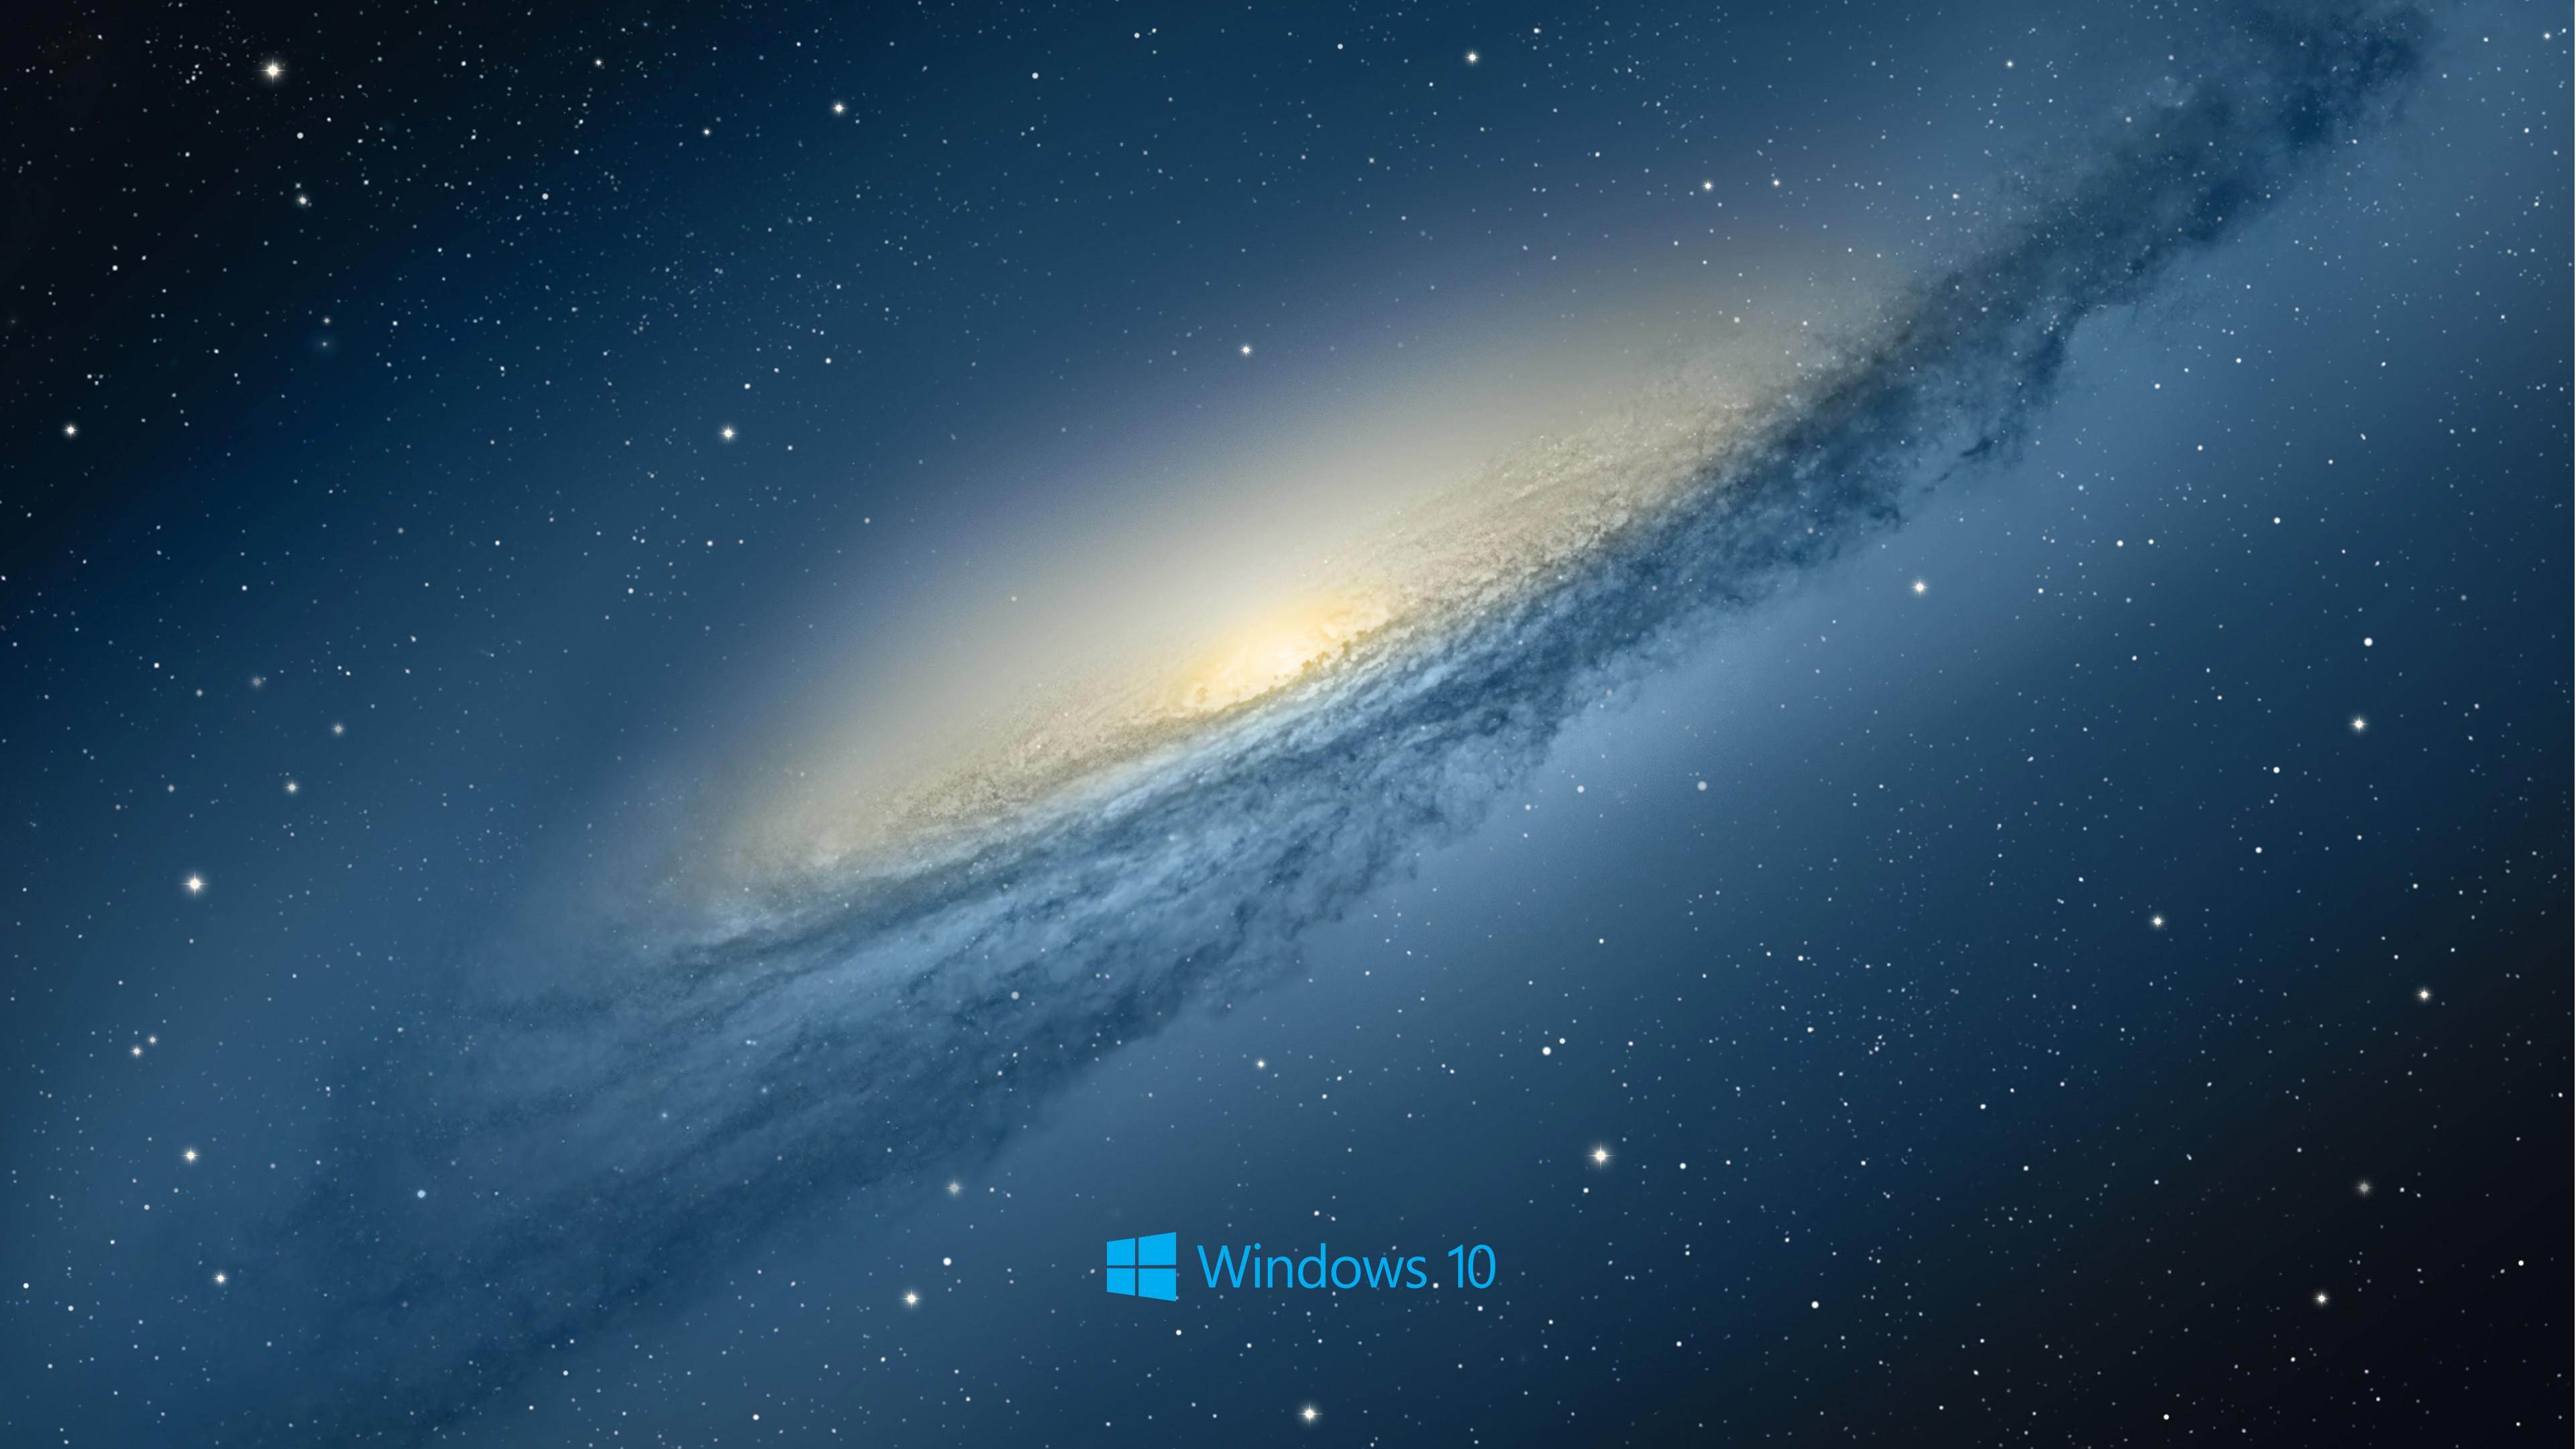 Animated Wallpaper Windows 10